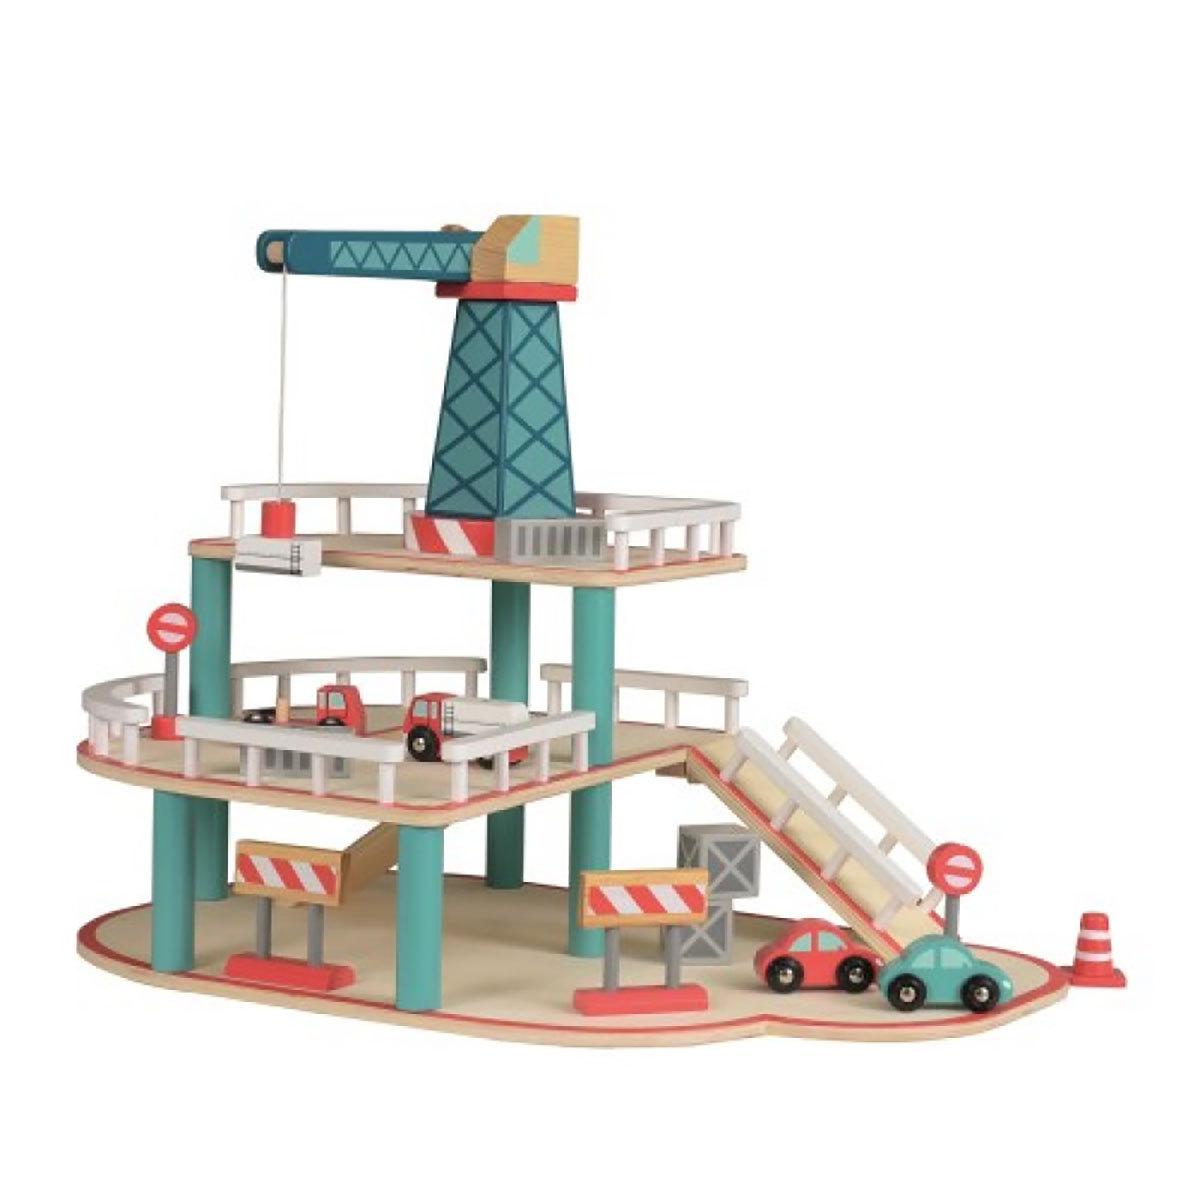 Mes premiers jouets Garage en Bois avec Grue Garage en Bois avec Grue